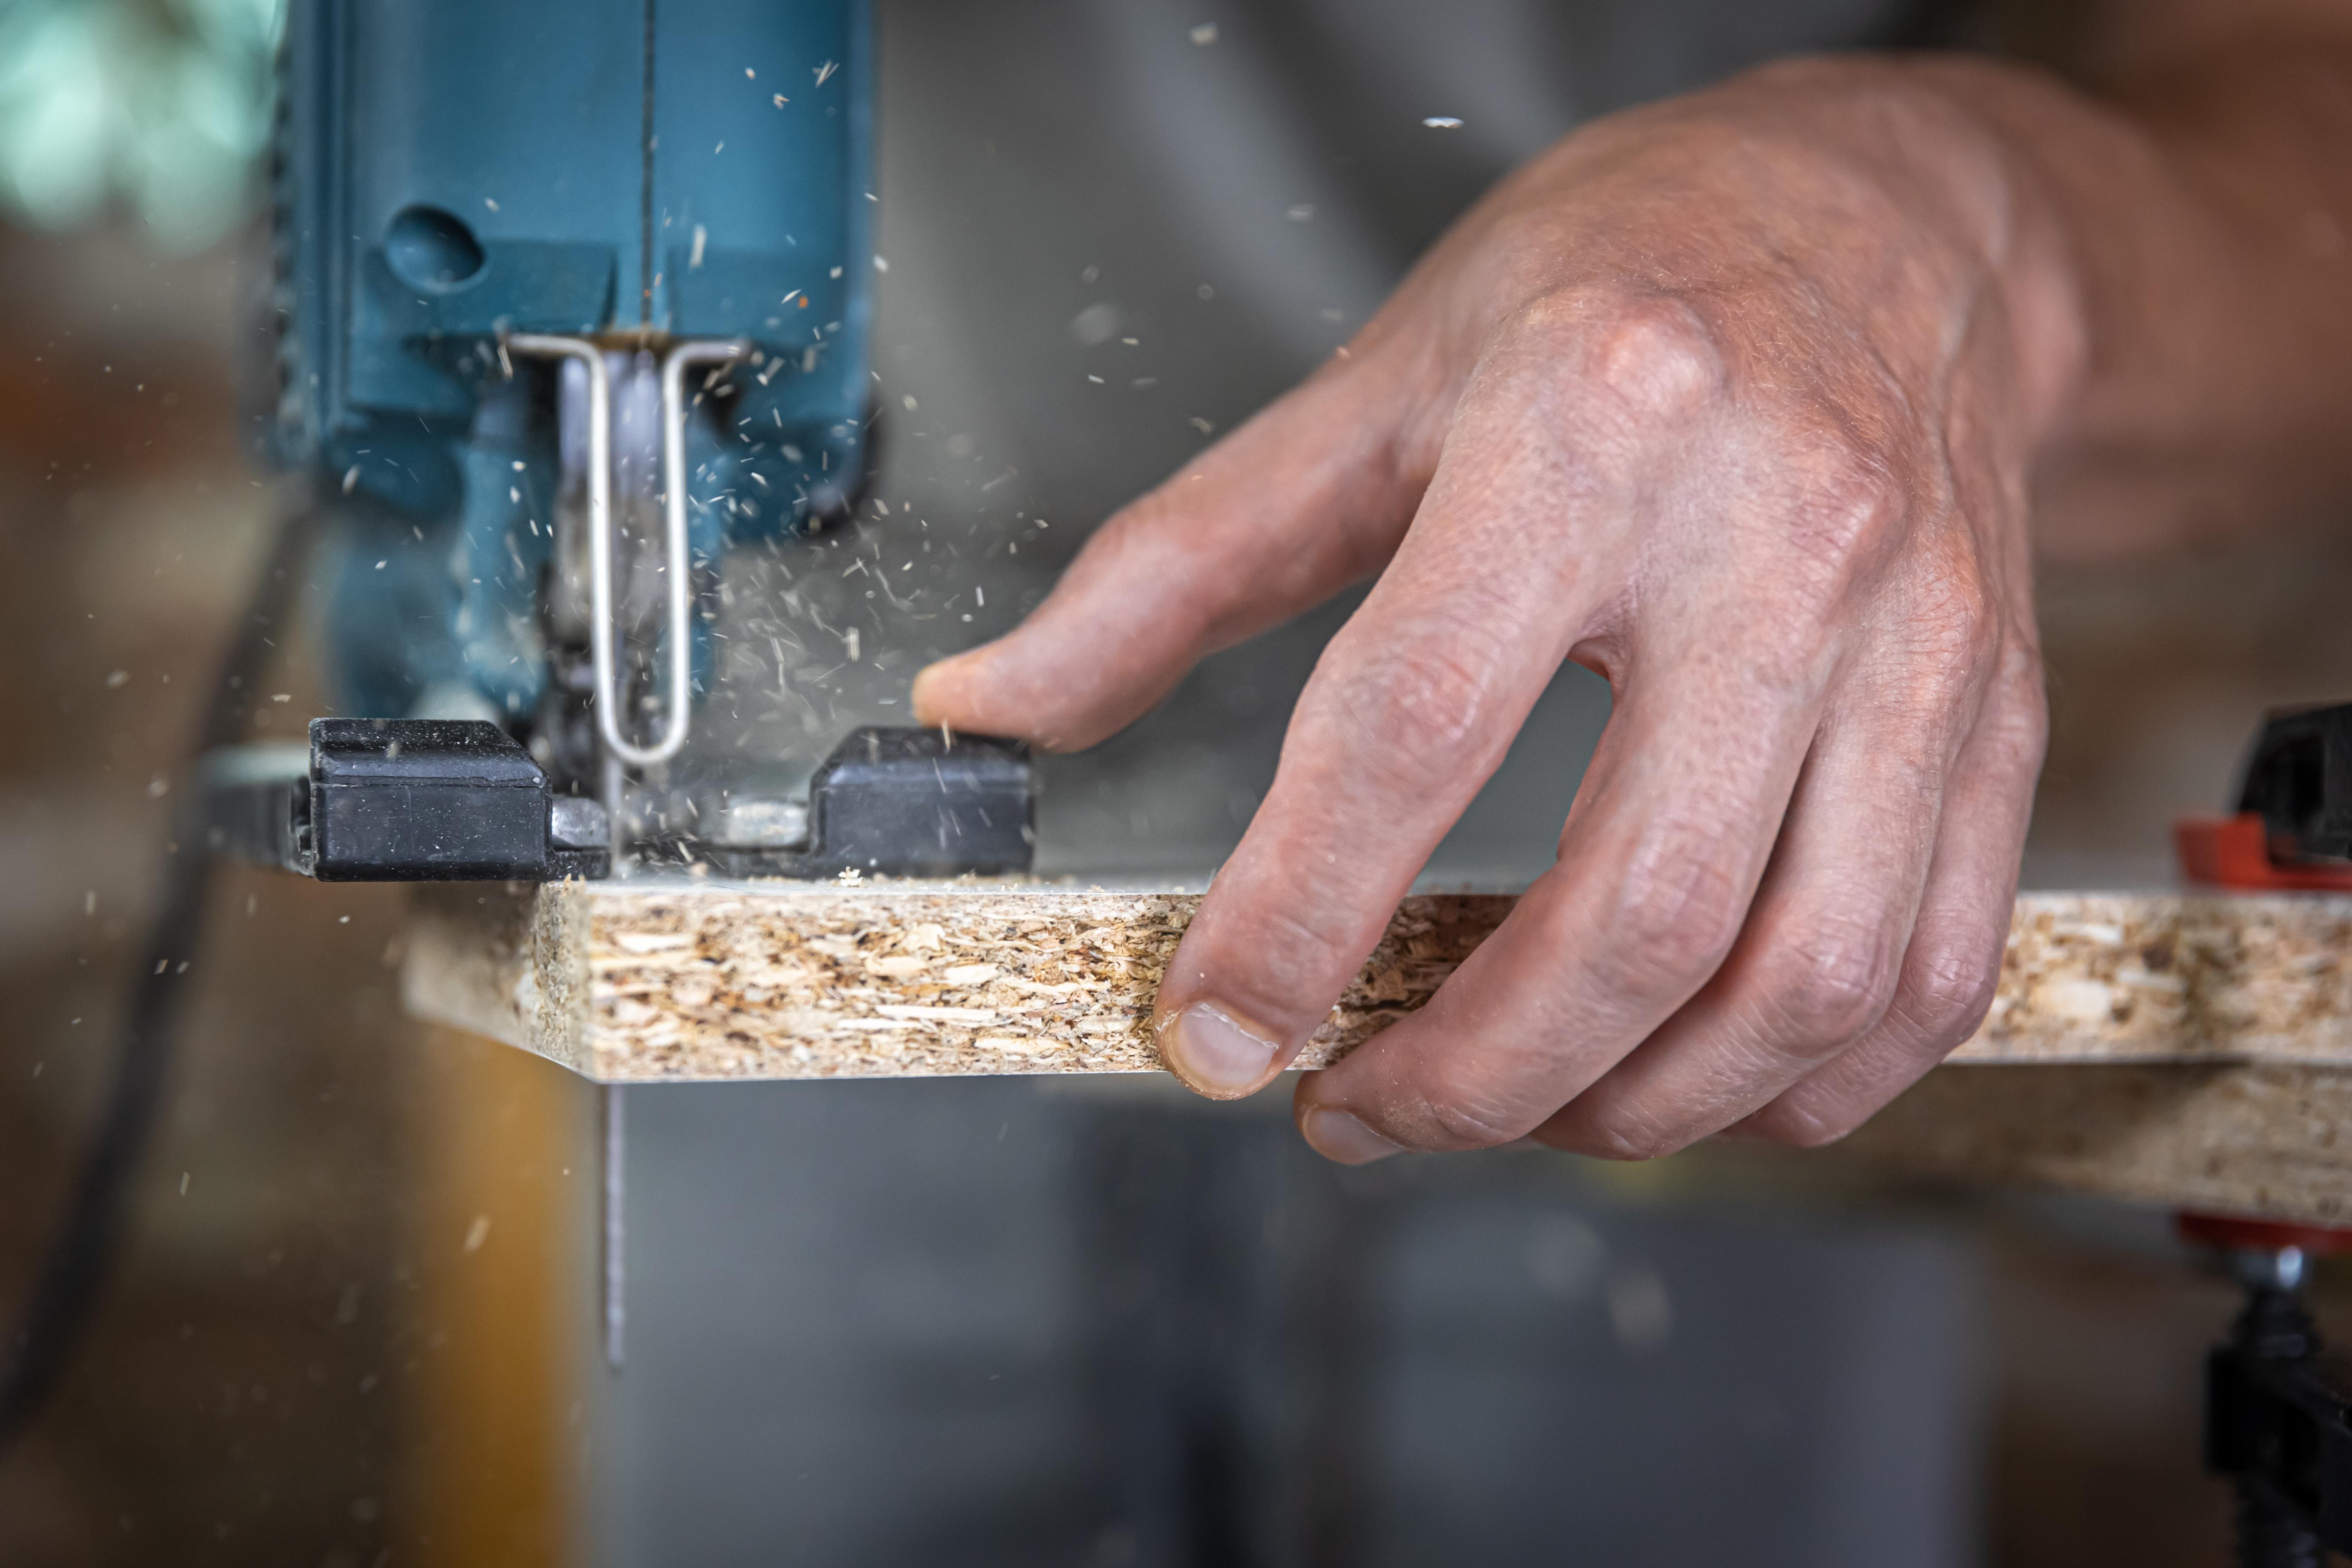 close-up-carpenter-s-hands-process-cutting-wood-with-jigsaw.jpg